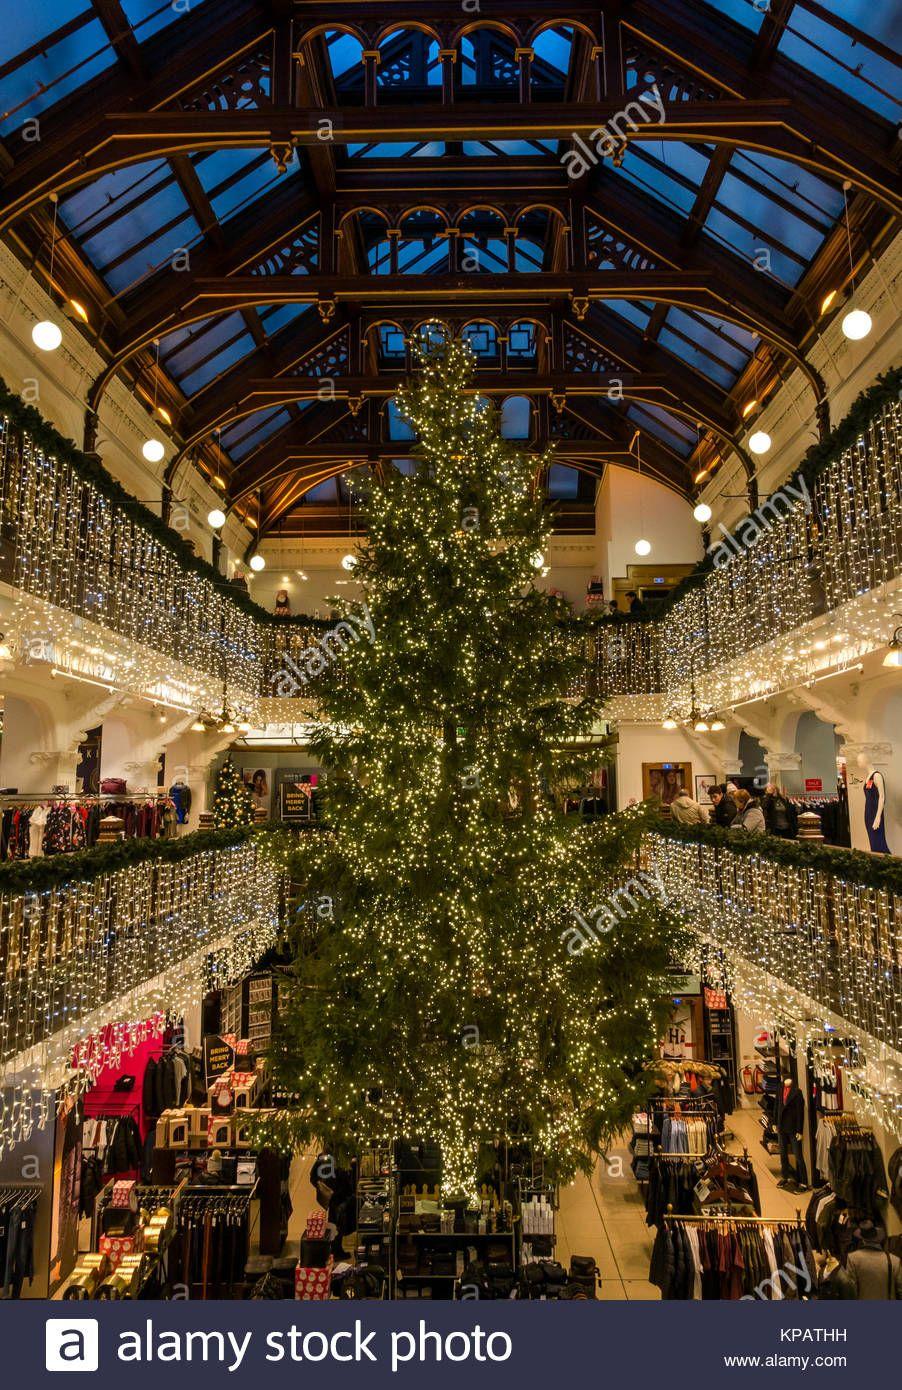 Victorian Christmas Tree Stock Photos Victorian In 2020 Victorian Christmas Tree Victorian Christmas Edinburgh Christmas Market